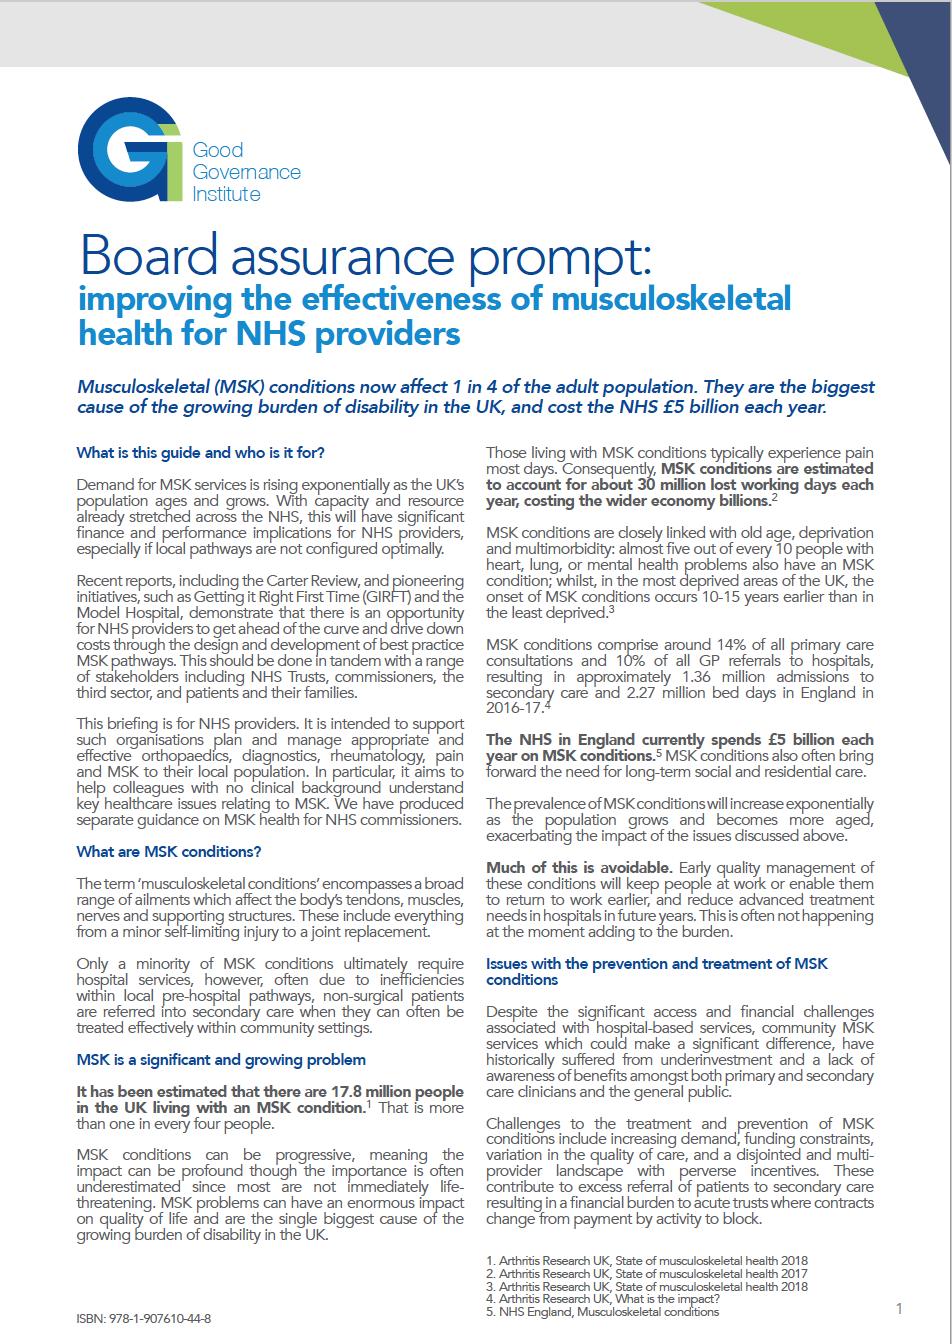 Board assurance prompt - MSK for NHS Providers